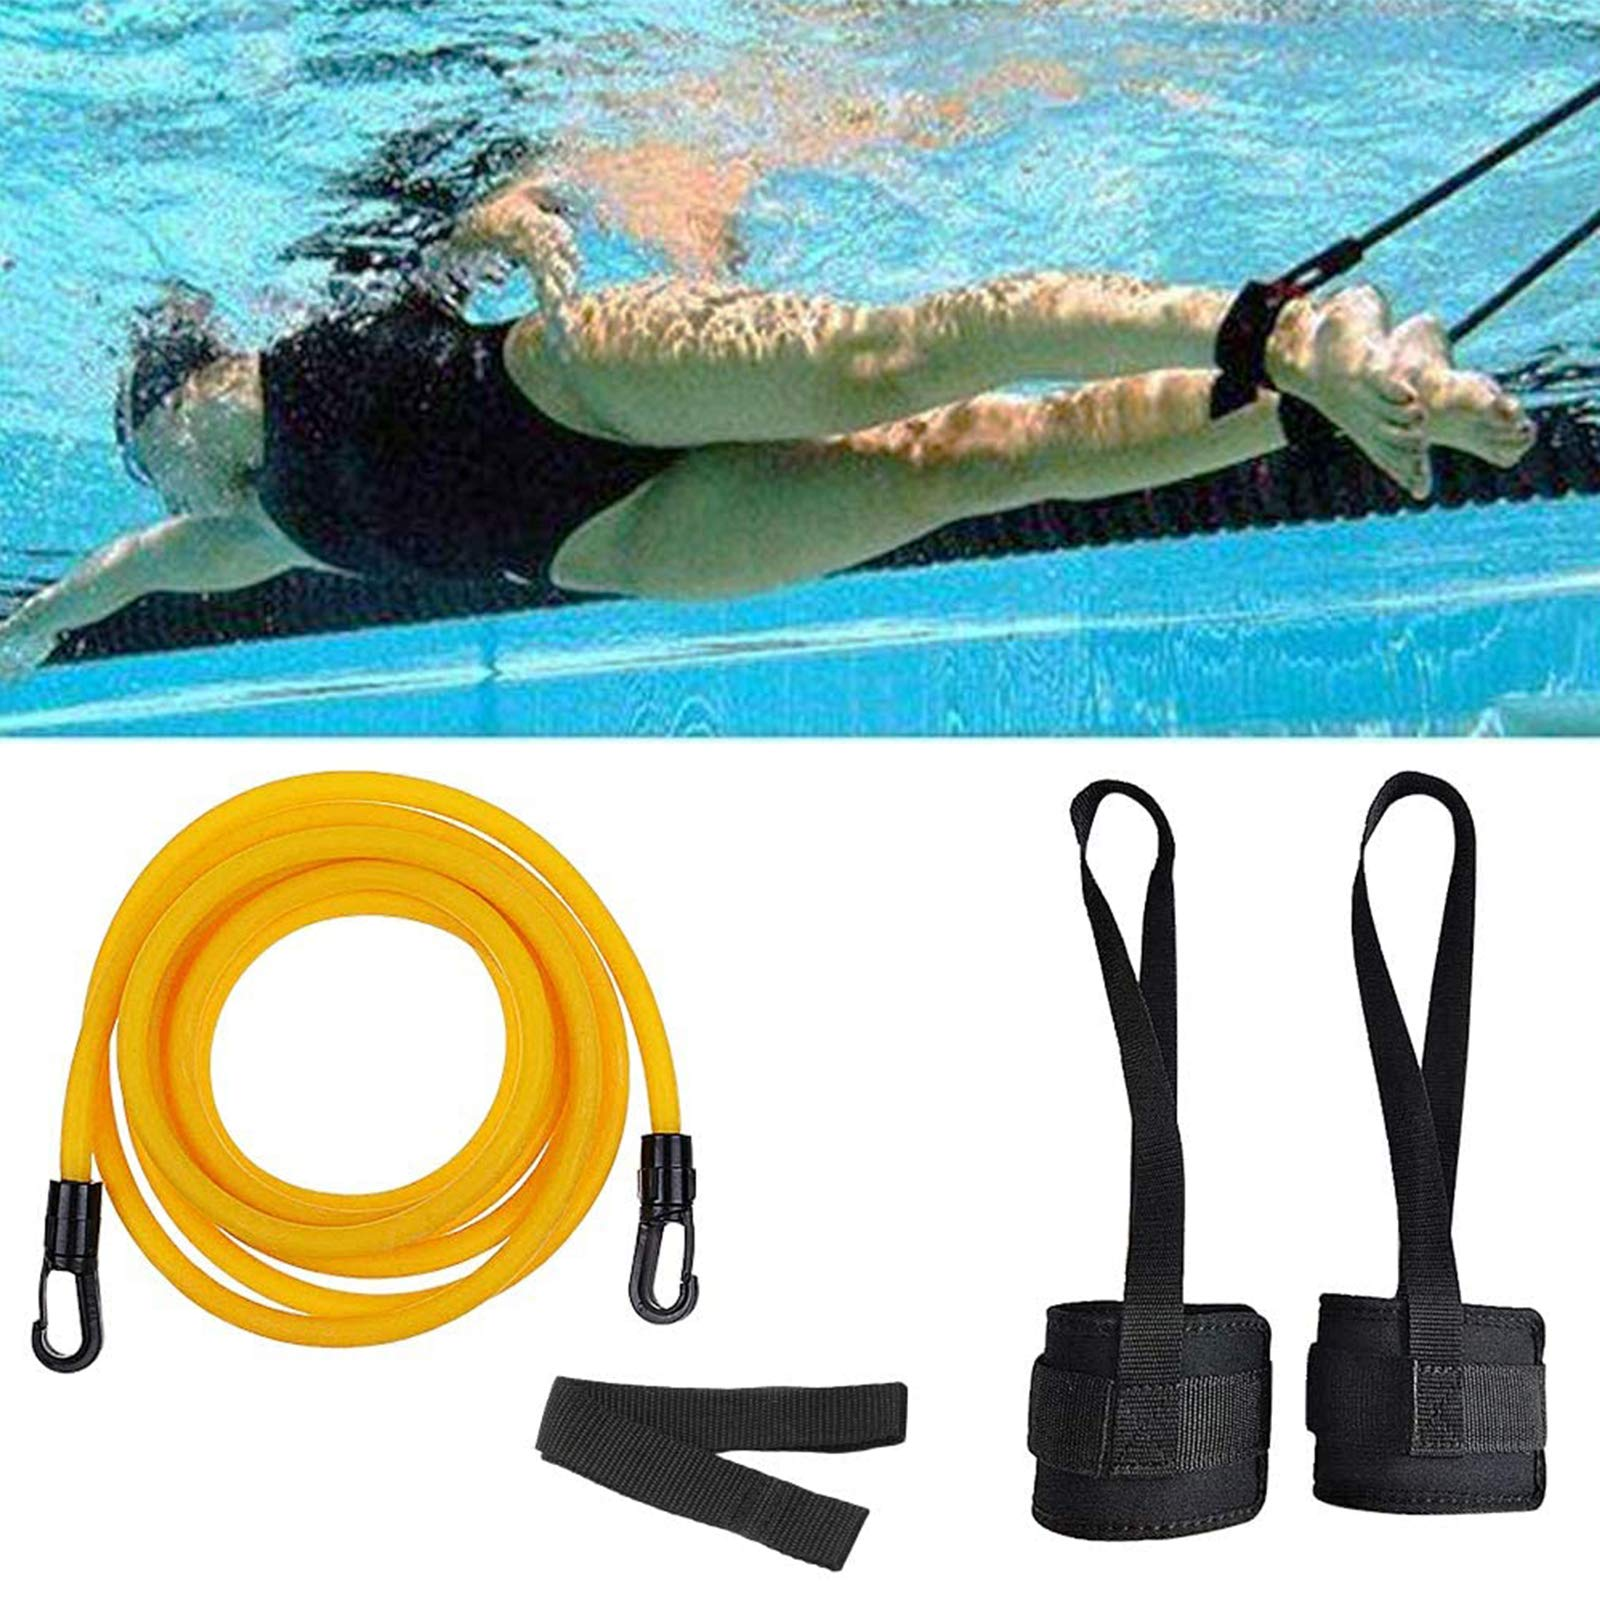 KIKIGOAL Swim Ankle Strap Stationary Swimmer Swim Lap Swim Training Leash